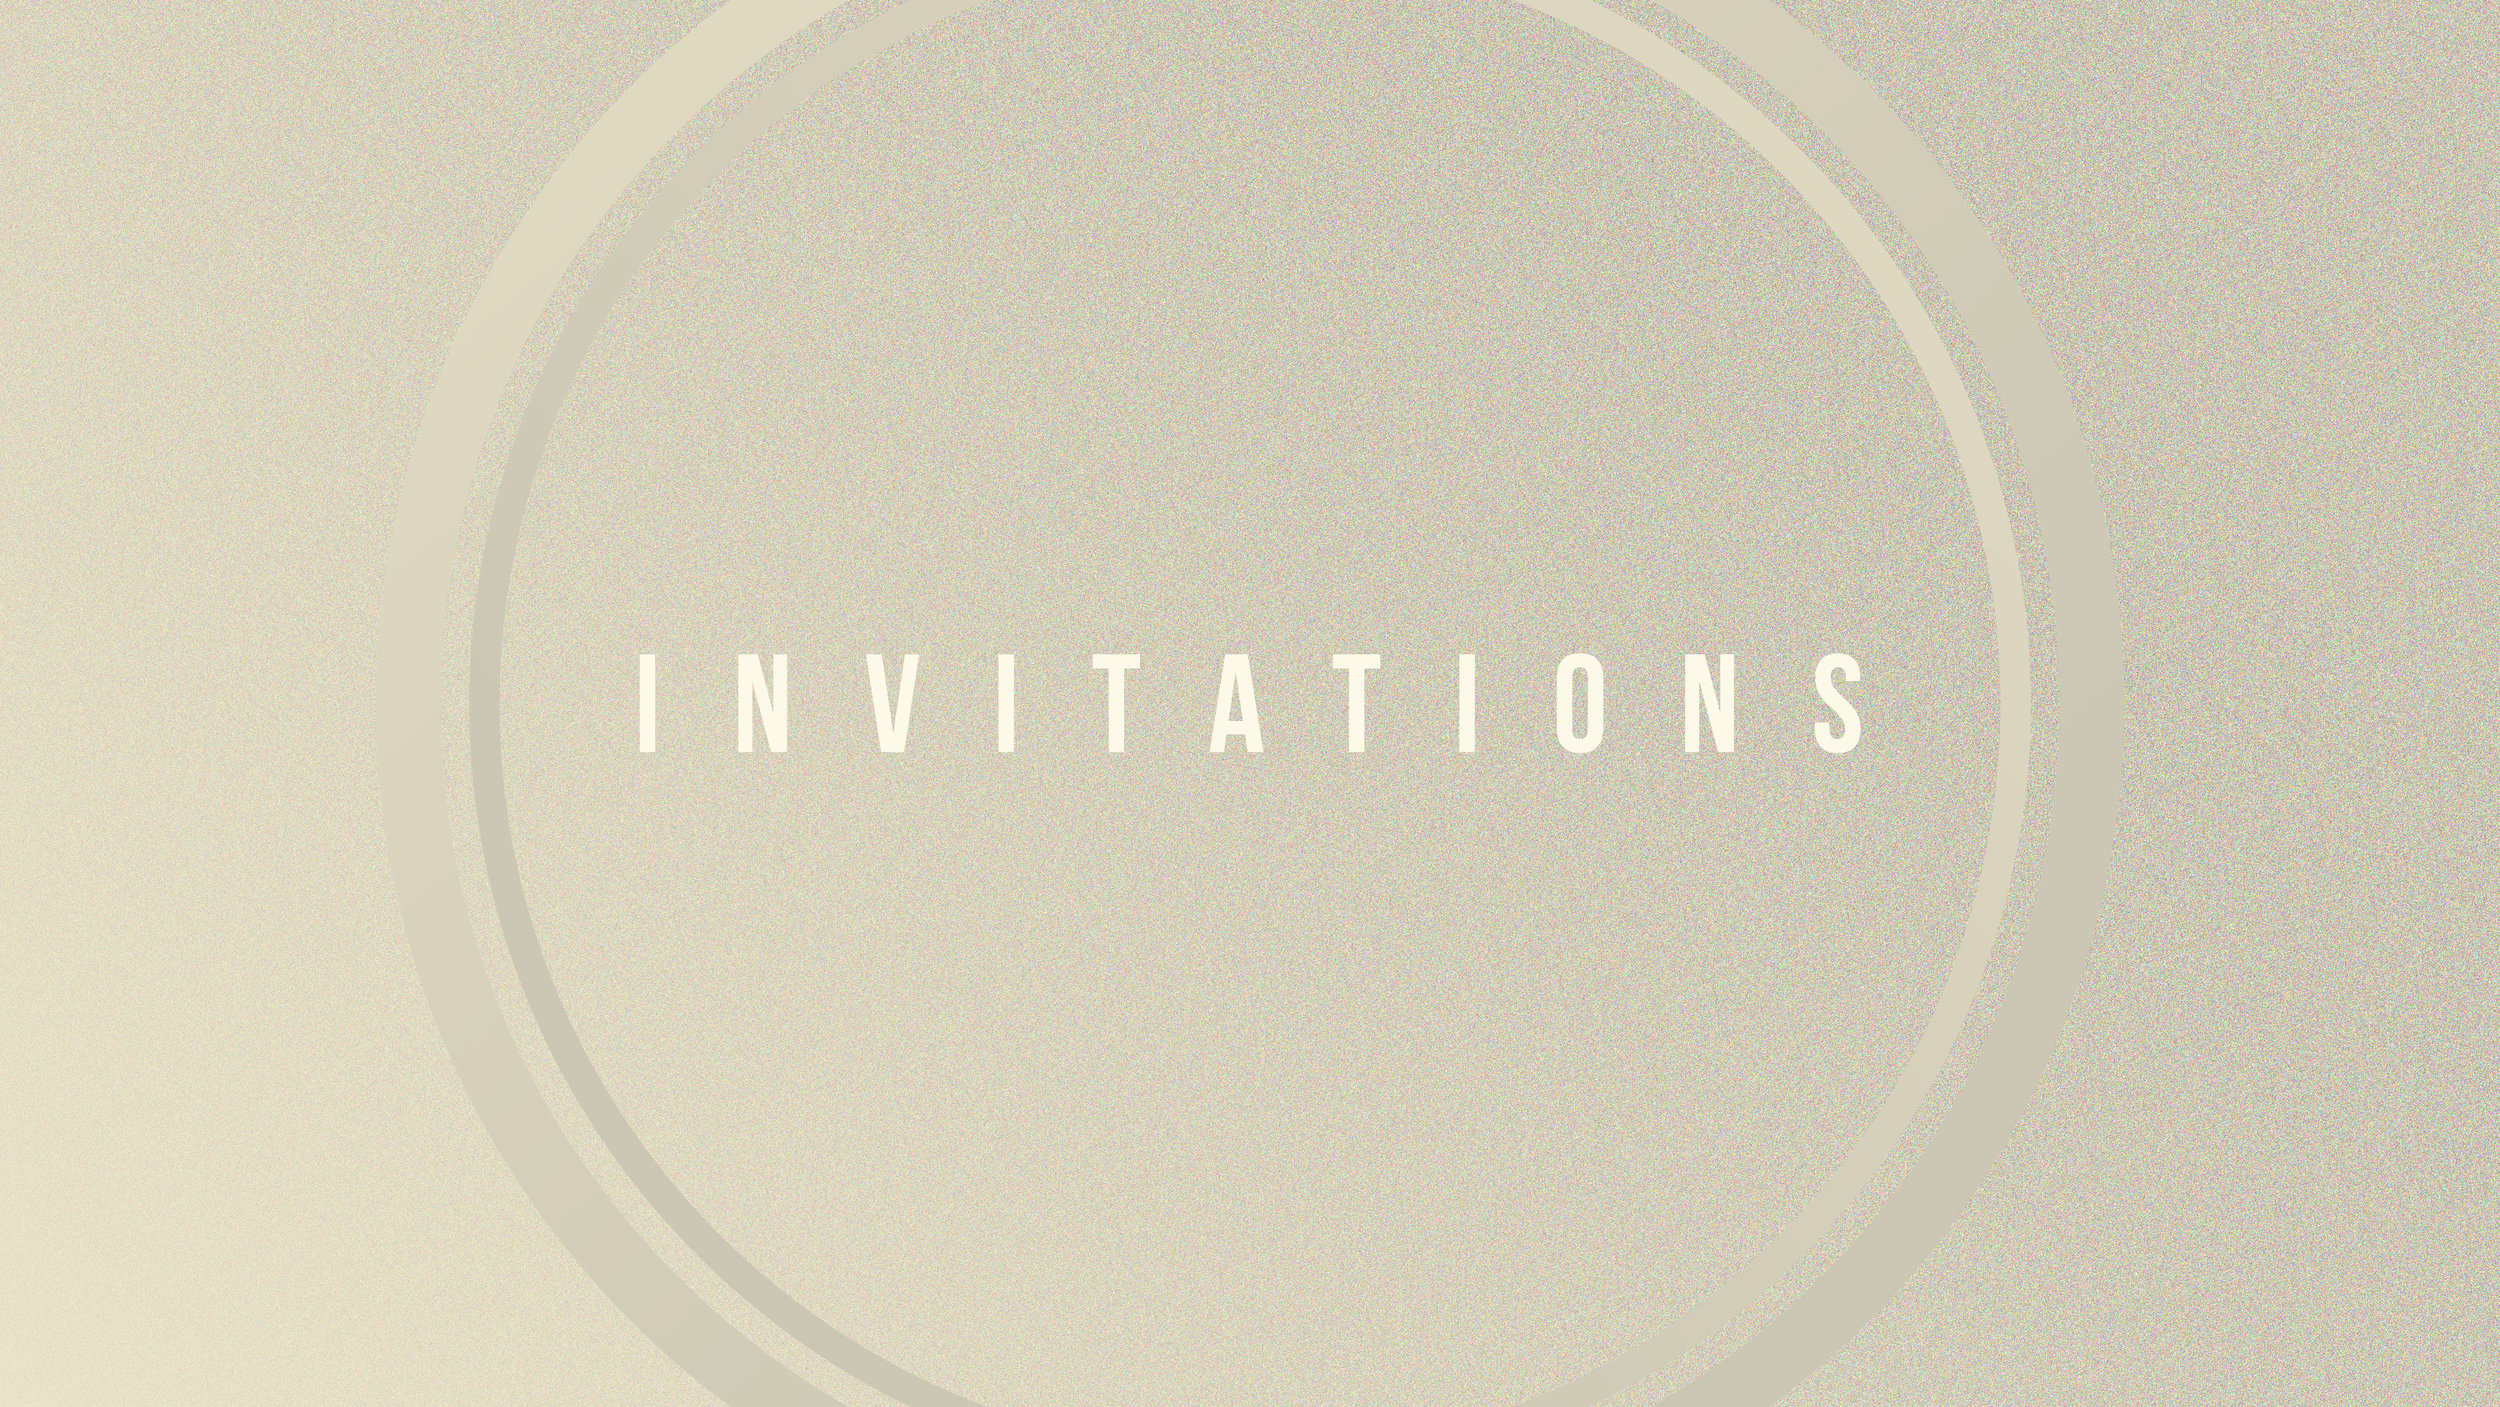 Invitations Title.jpg